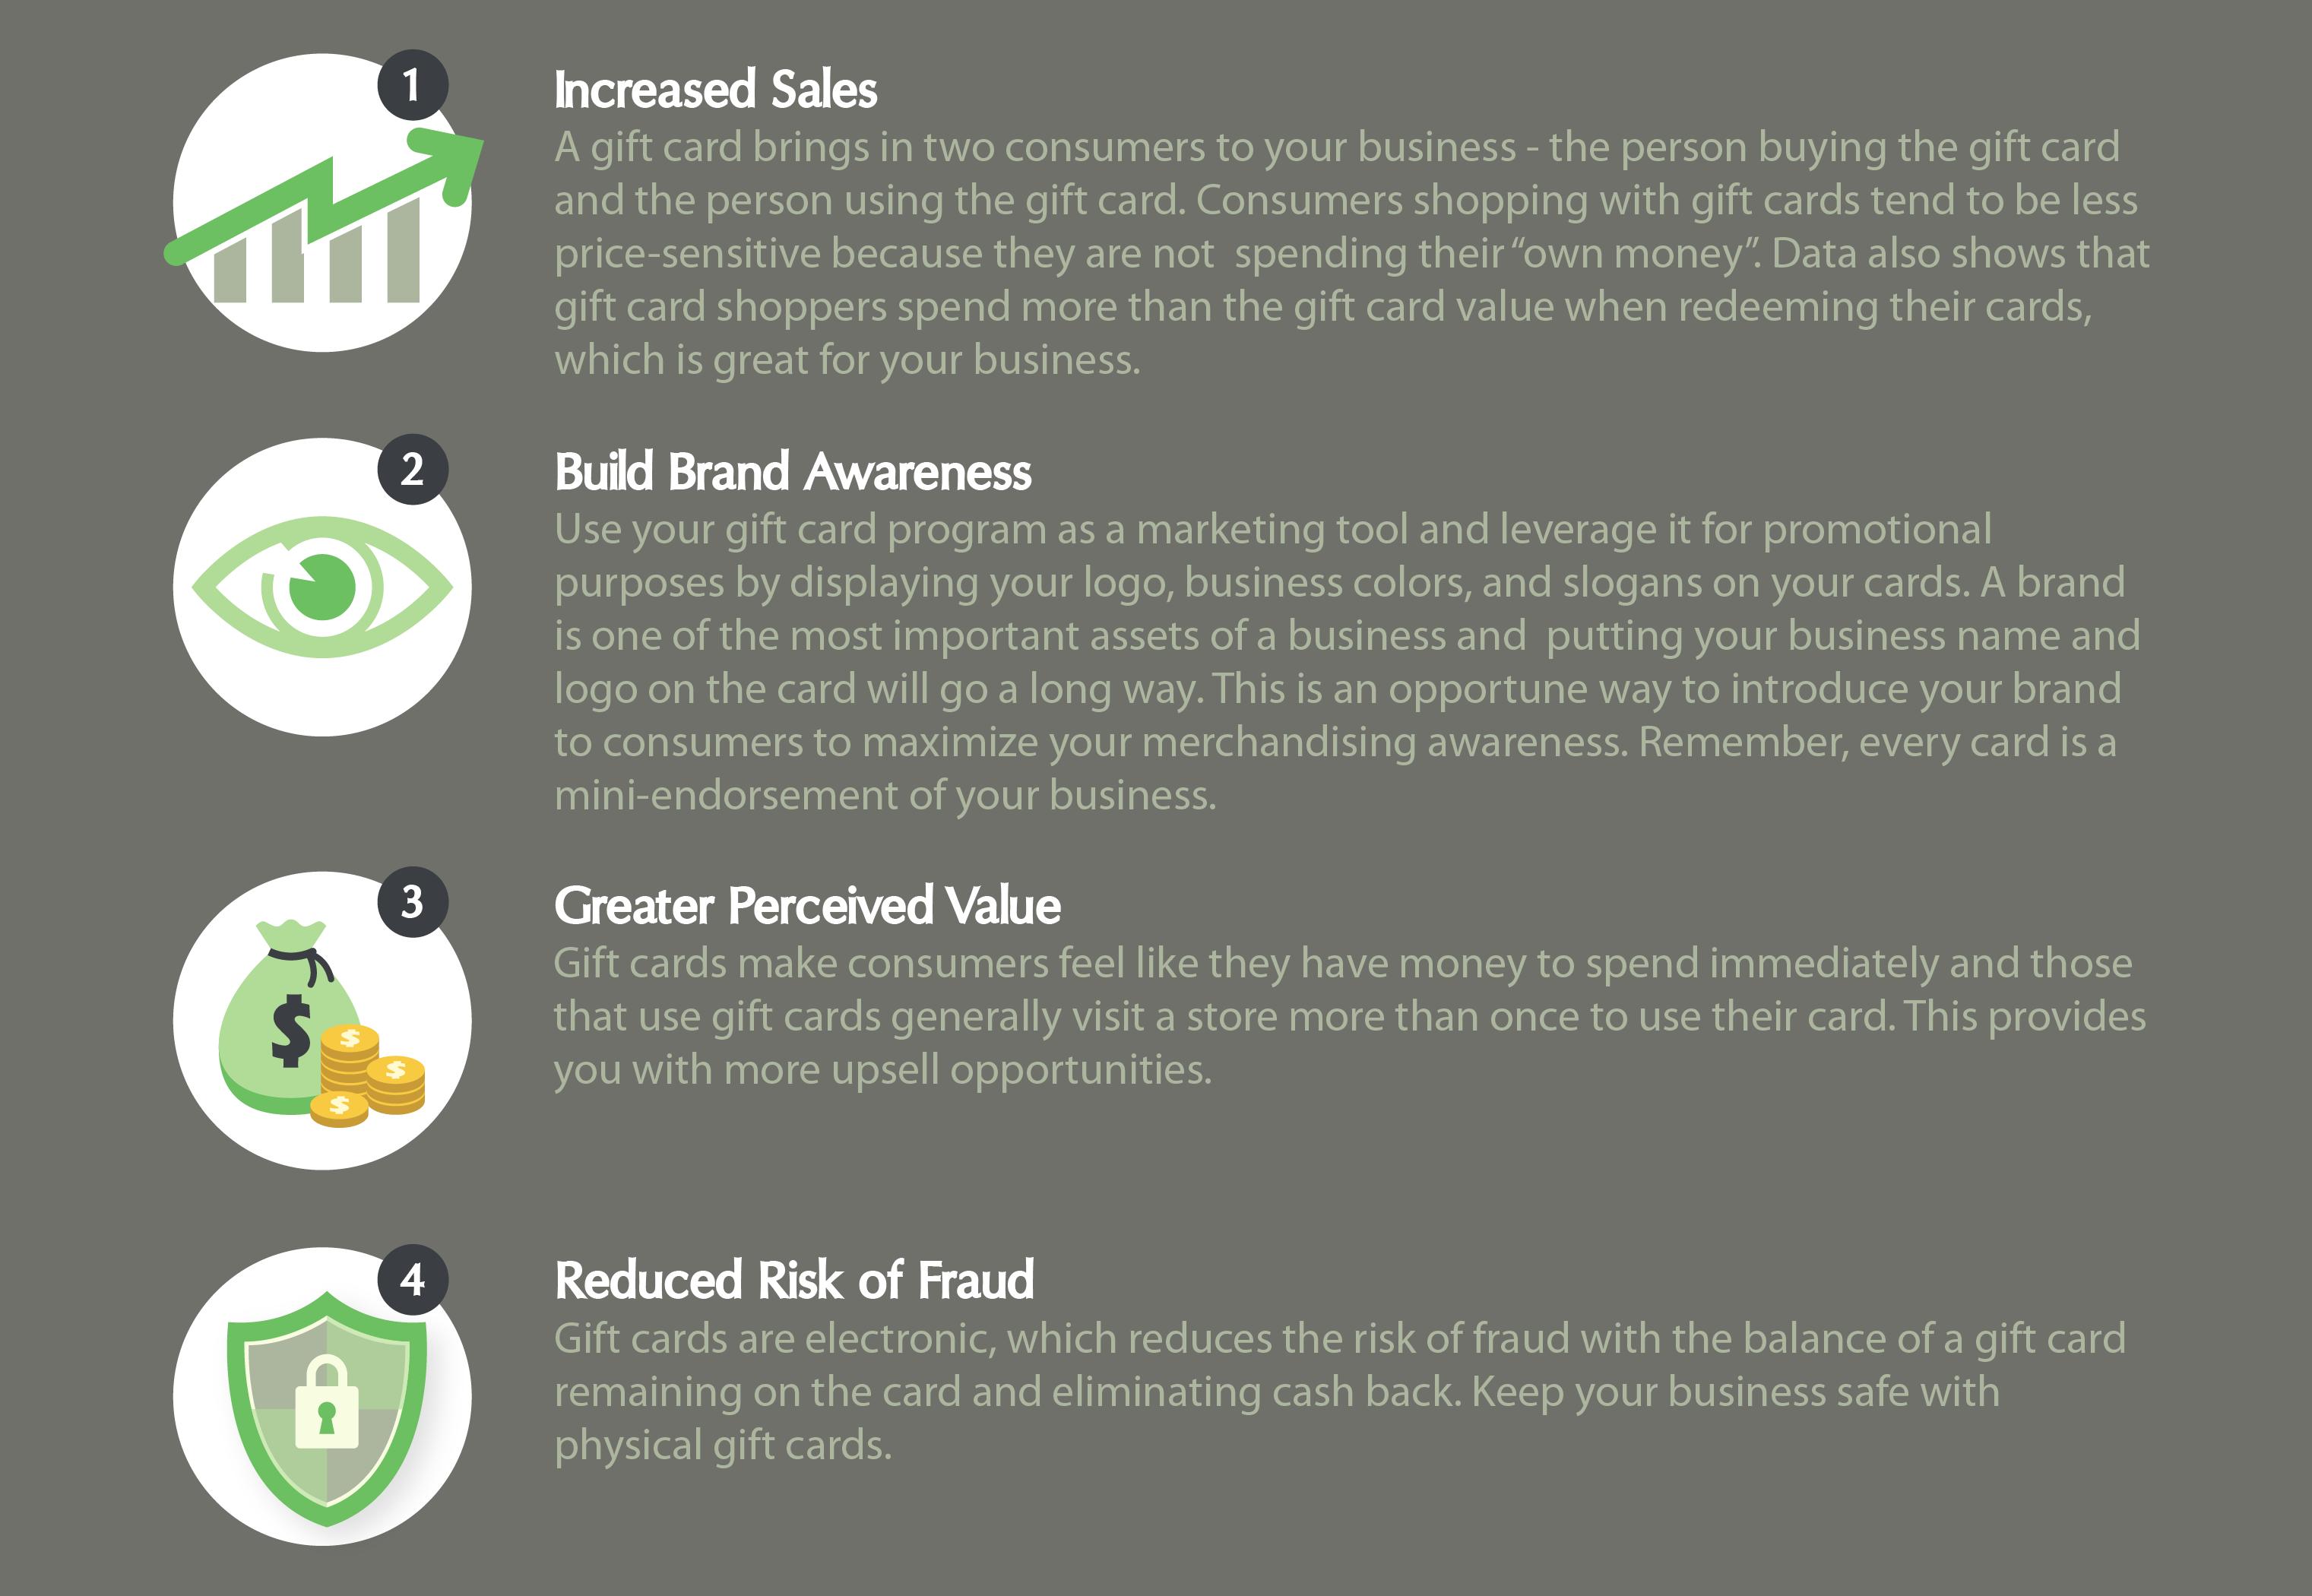 International bancard blog gift card 4 business advantages of a gift card program colourmoves Images